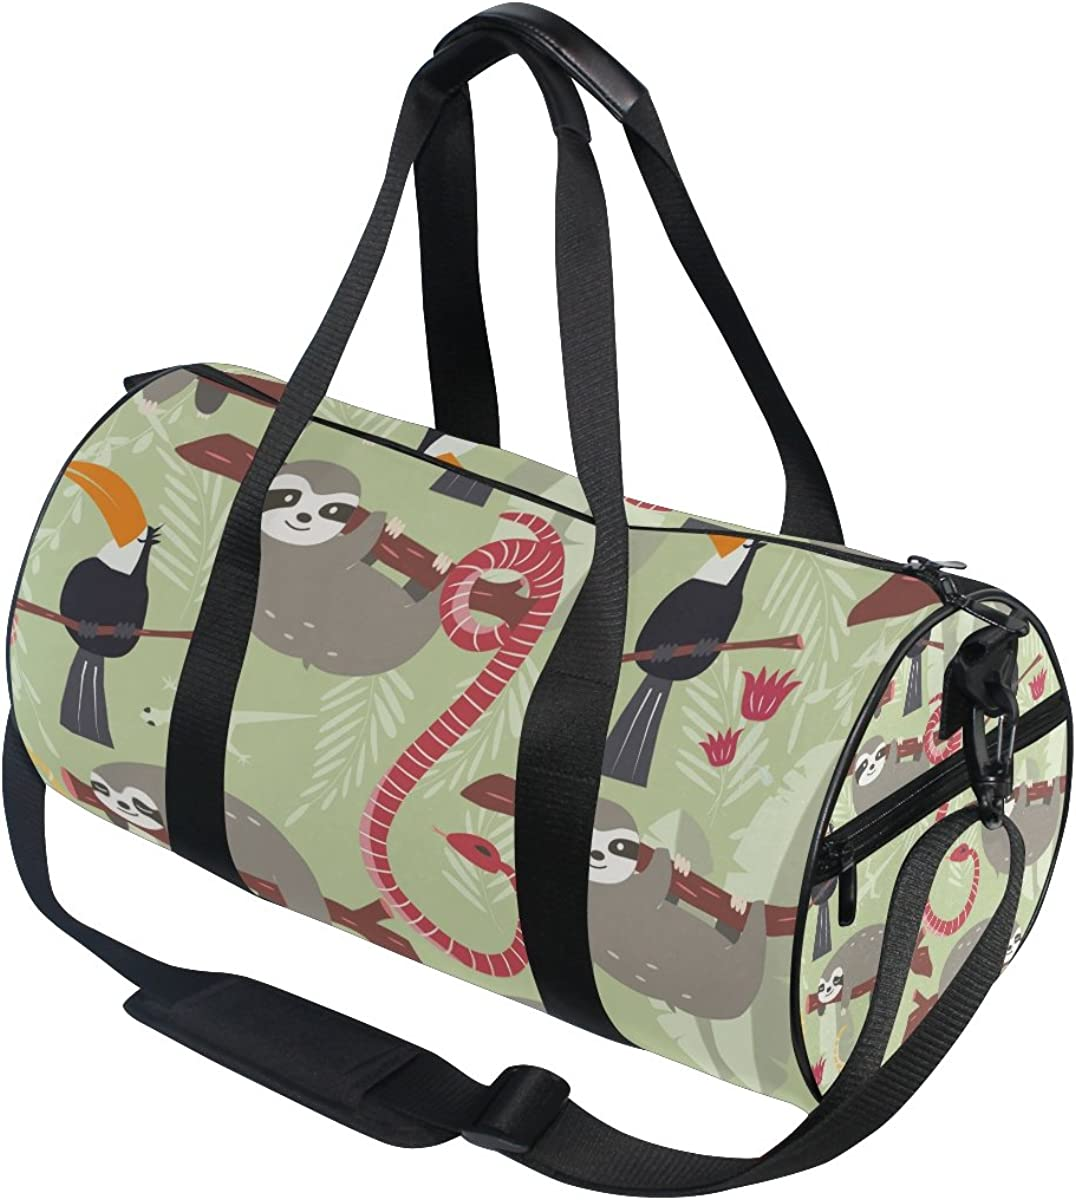 Evolutions Cute Baby Sloth Tree Floral Flowers Travel Duffel Bag Sports Gym Bag For Men